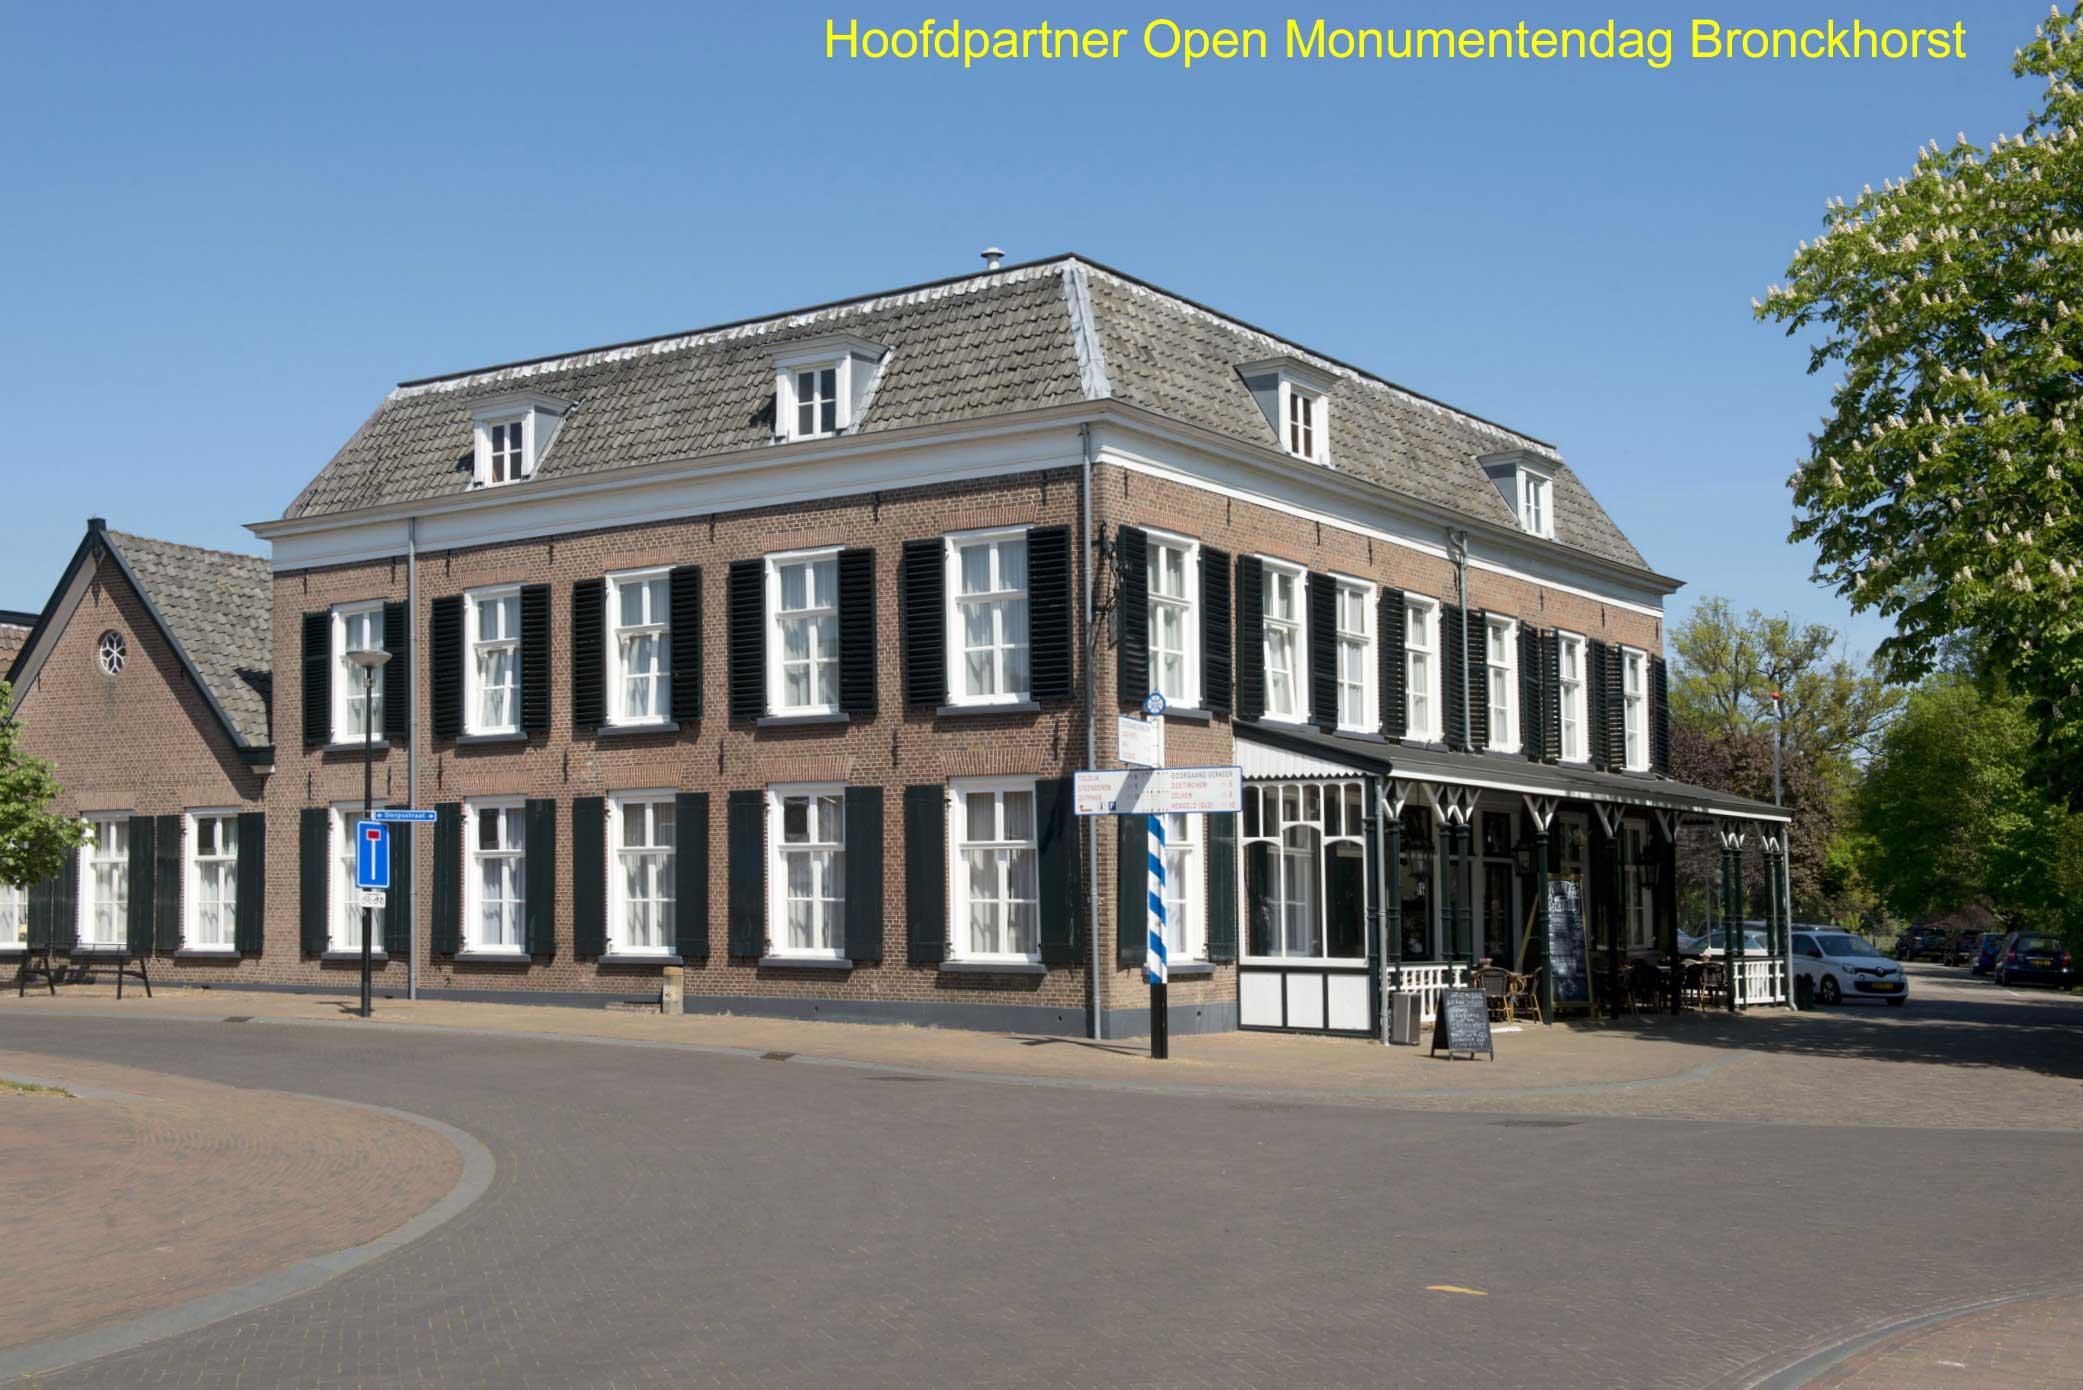 Hummelo Dorpsstraat 9 De Gouden Karper